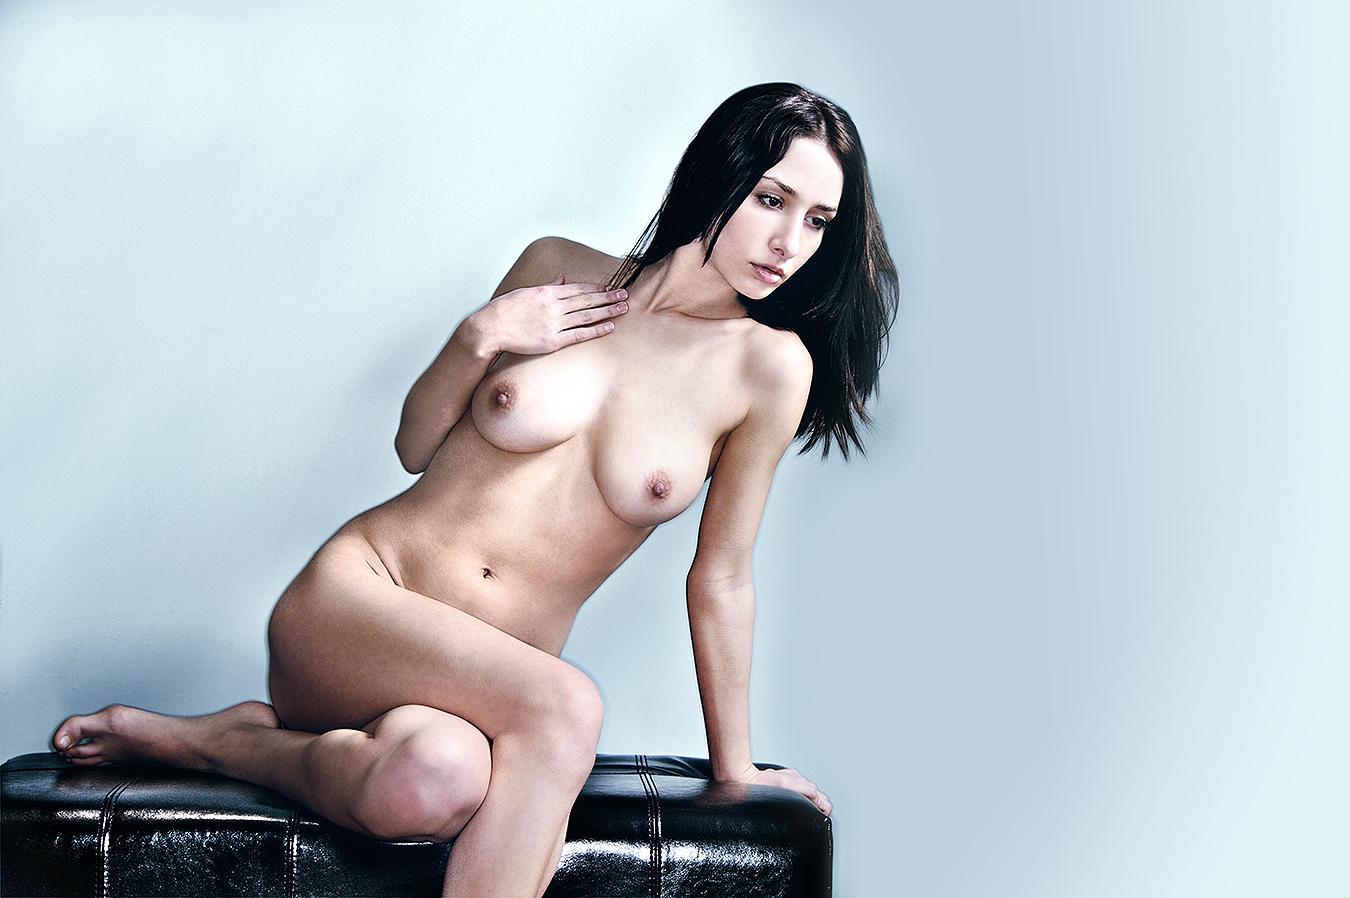 Tony_Ward_Studio_fashion_photography_Model_isabella_Reneaux_nudes_nudity_erotica_fashion_lingerie_unshaven_sitting